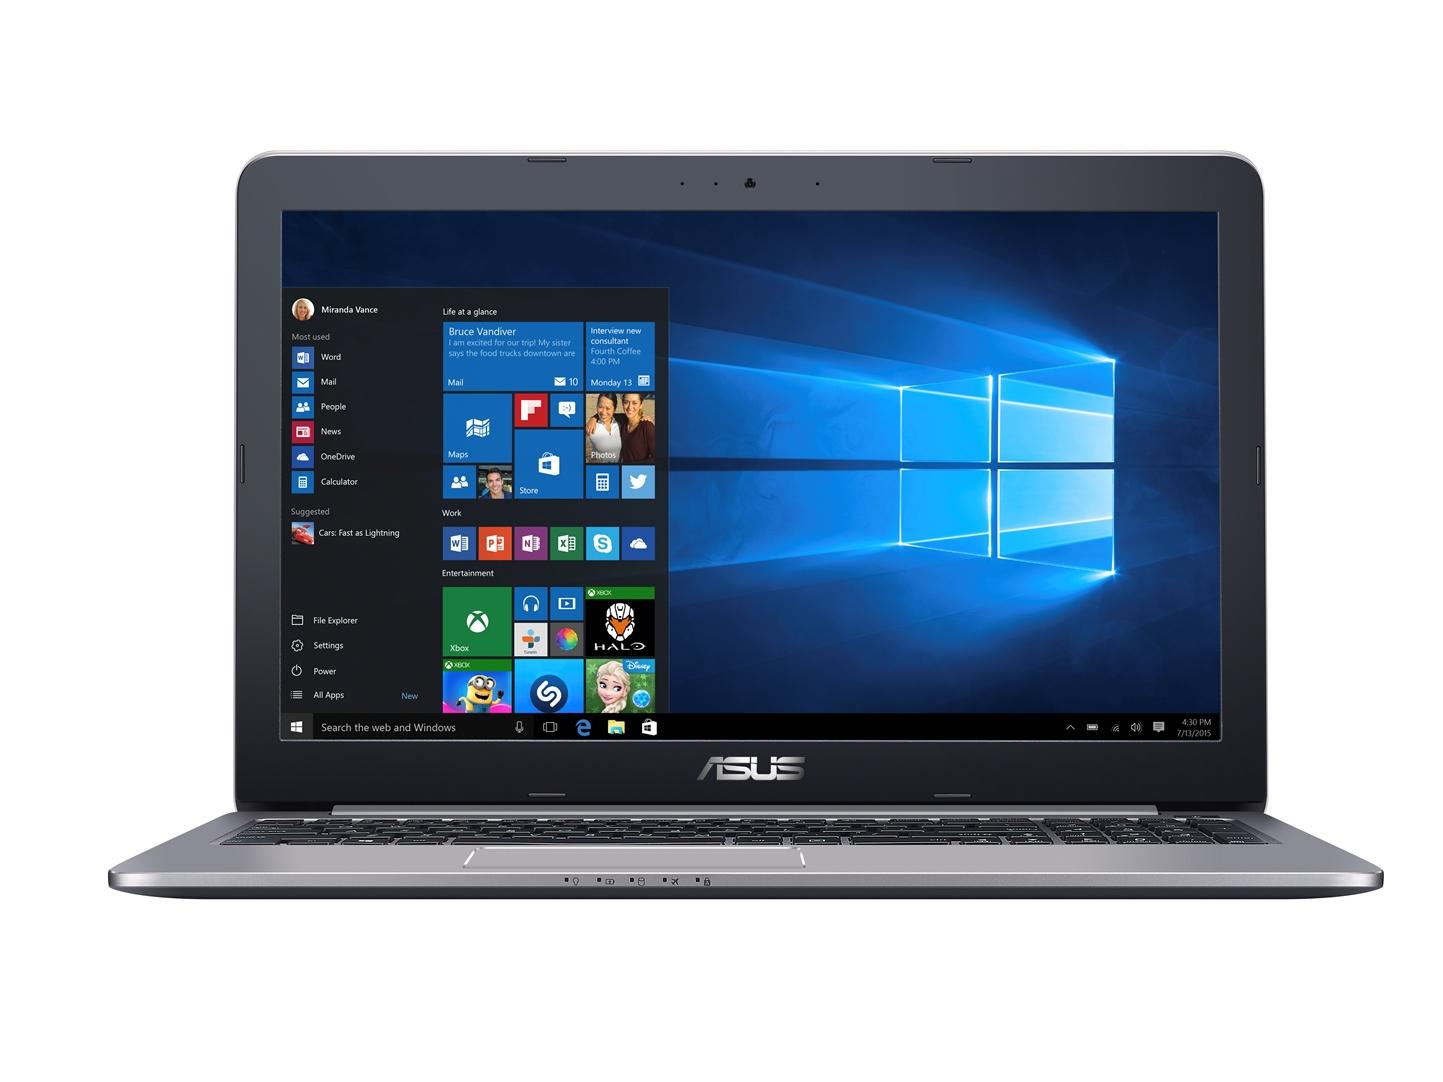 "ASUS K501UW-DM043T i7-6500U/8G/512G SSD SATA3/GTX960M 4G/15,6"" FHD/W10/Grey"